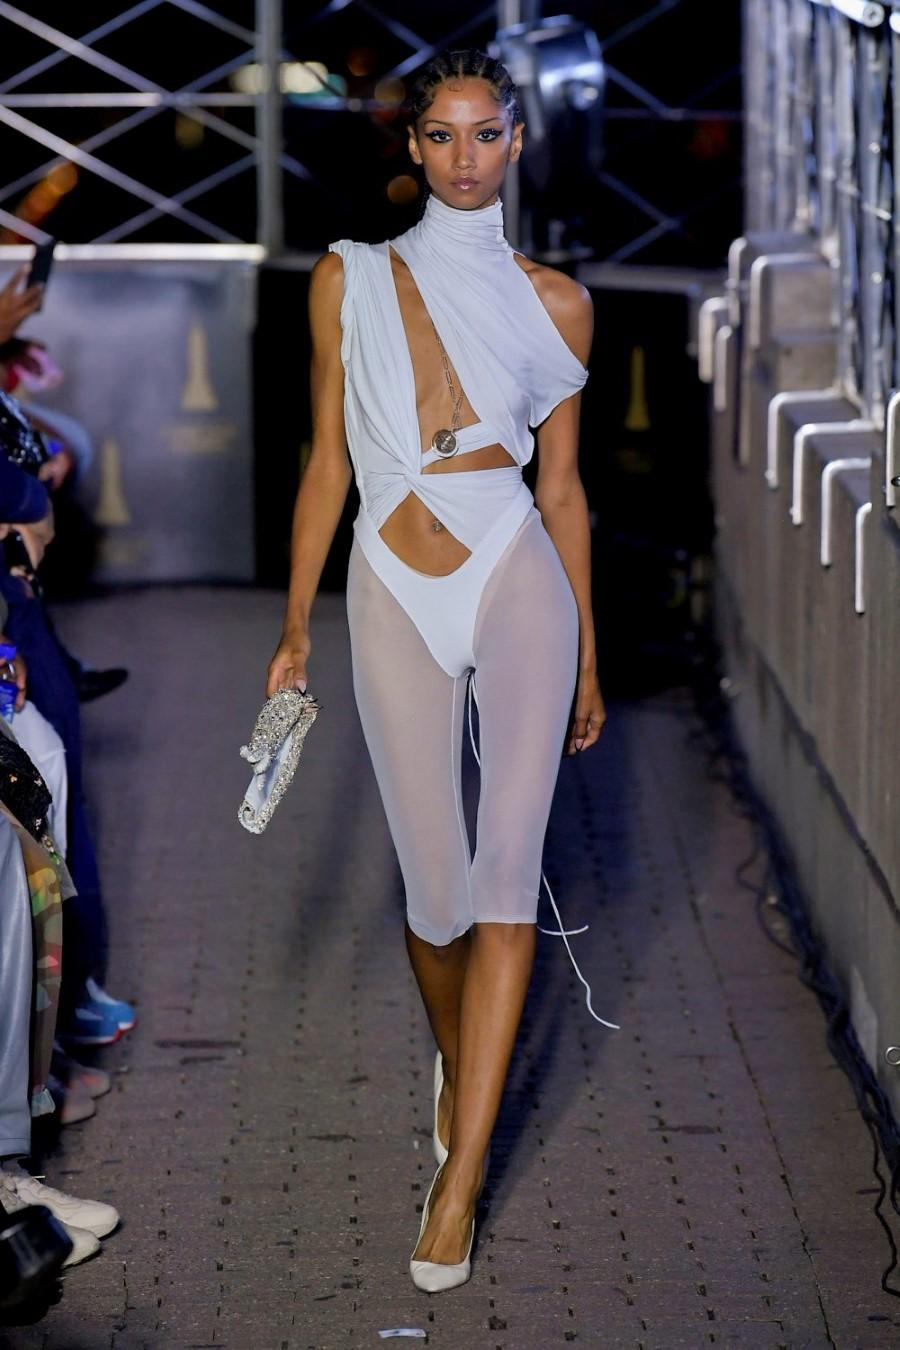 LaQuan Smith Spring Summer 2022 - New York Fashion Week